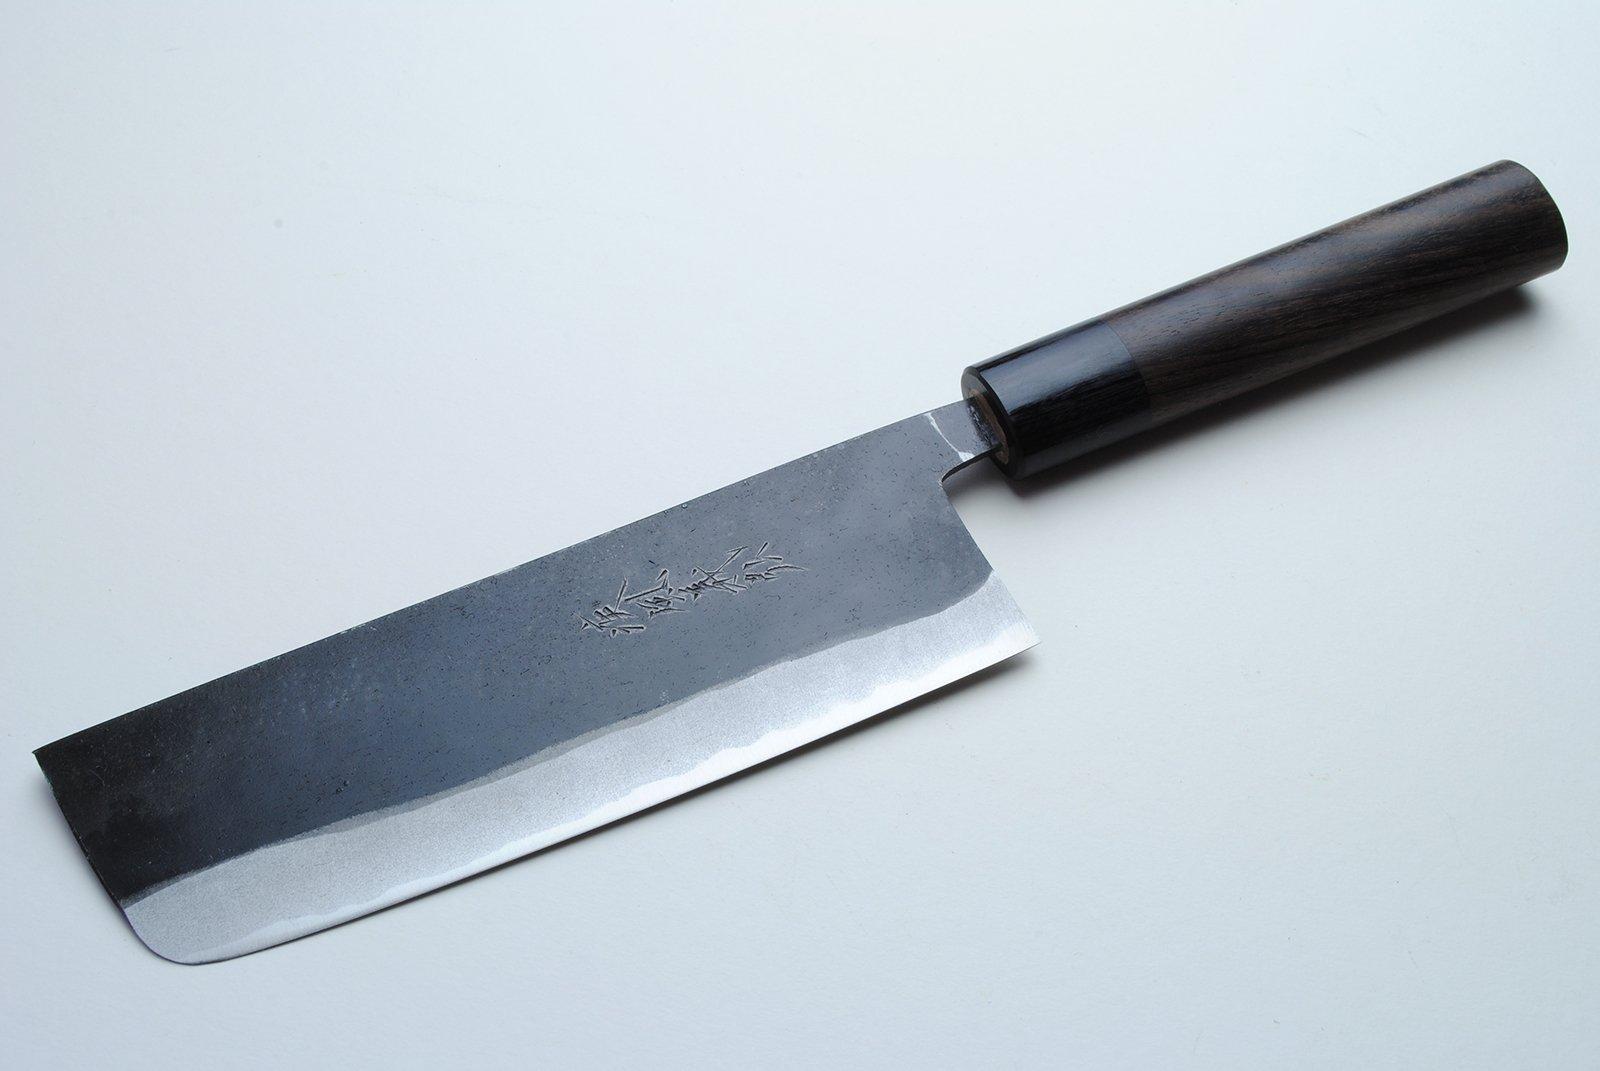 Yoshihiro Mizu Yaki Aogami Super Blue High Carbon Steel Kurouchi Usuba Chef's Knife 6.5 In